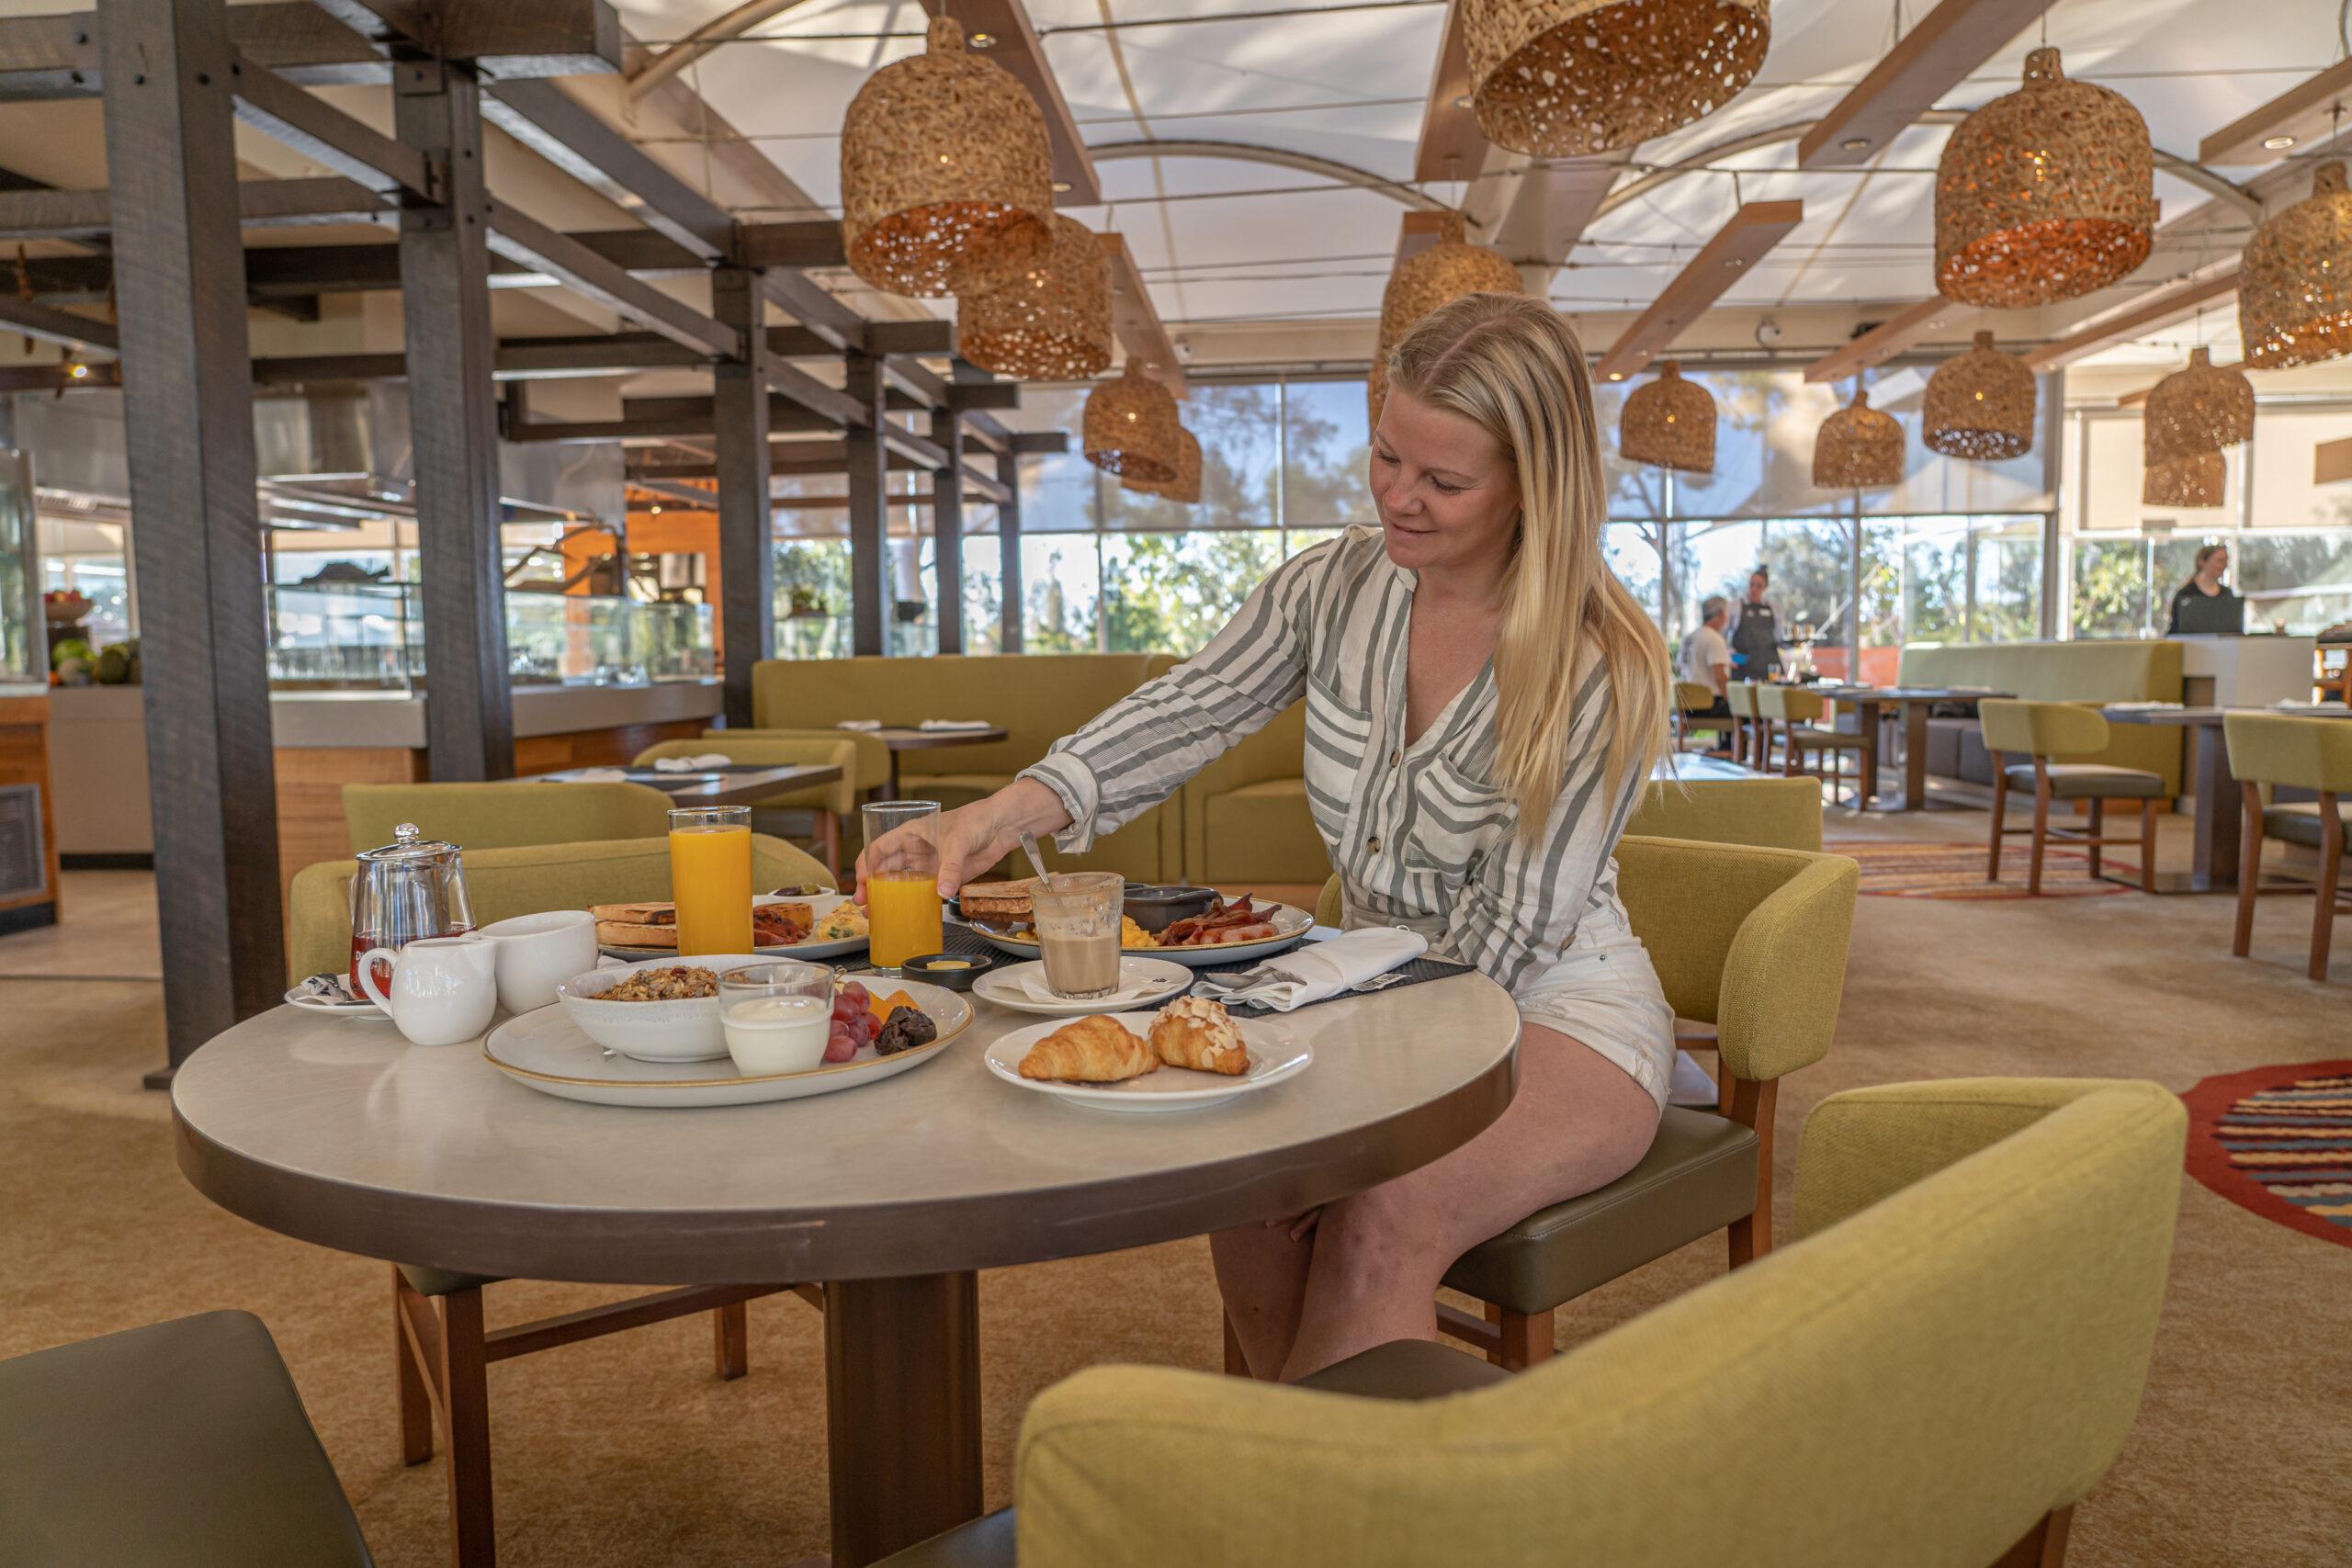 Sails in the Desert Hotel - Vagabonds of Sweden